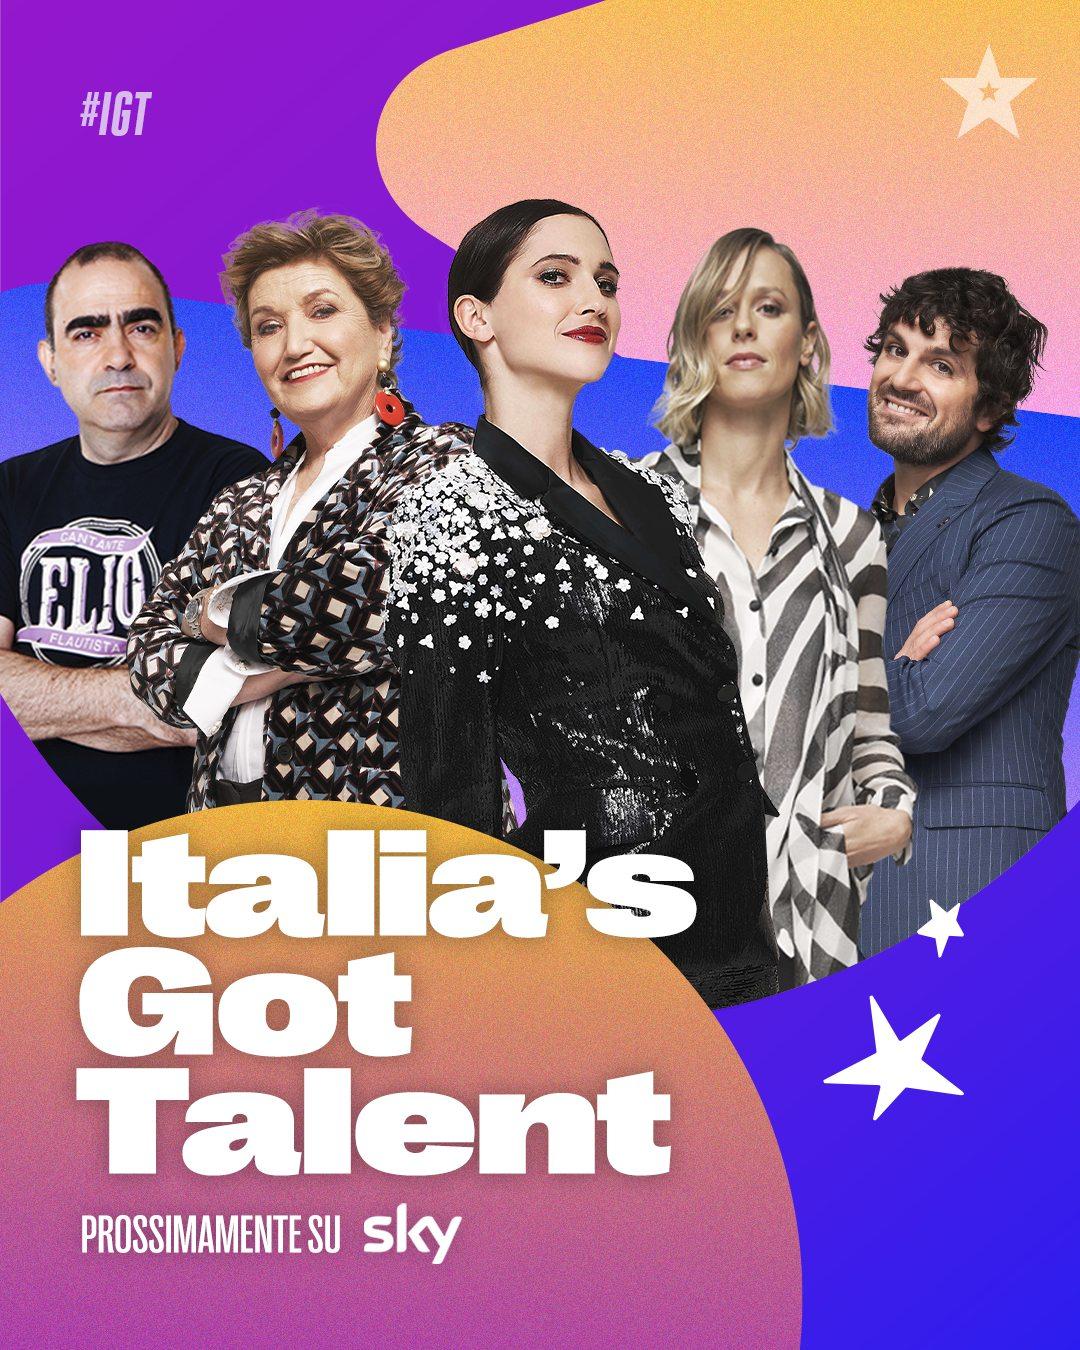 ITALIA'S GOT TALENT - A GENNAIO SU SKY E NOW